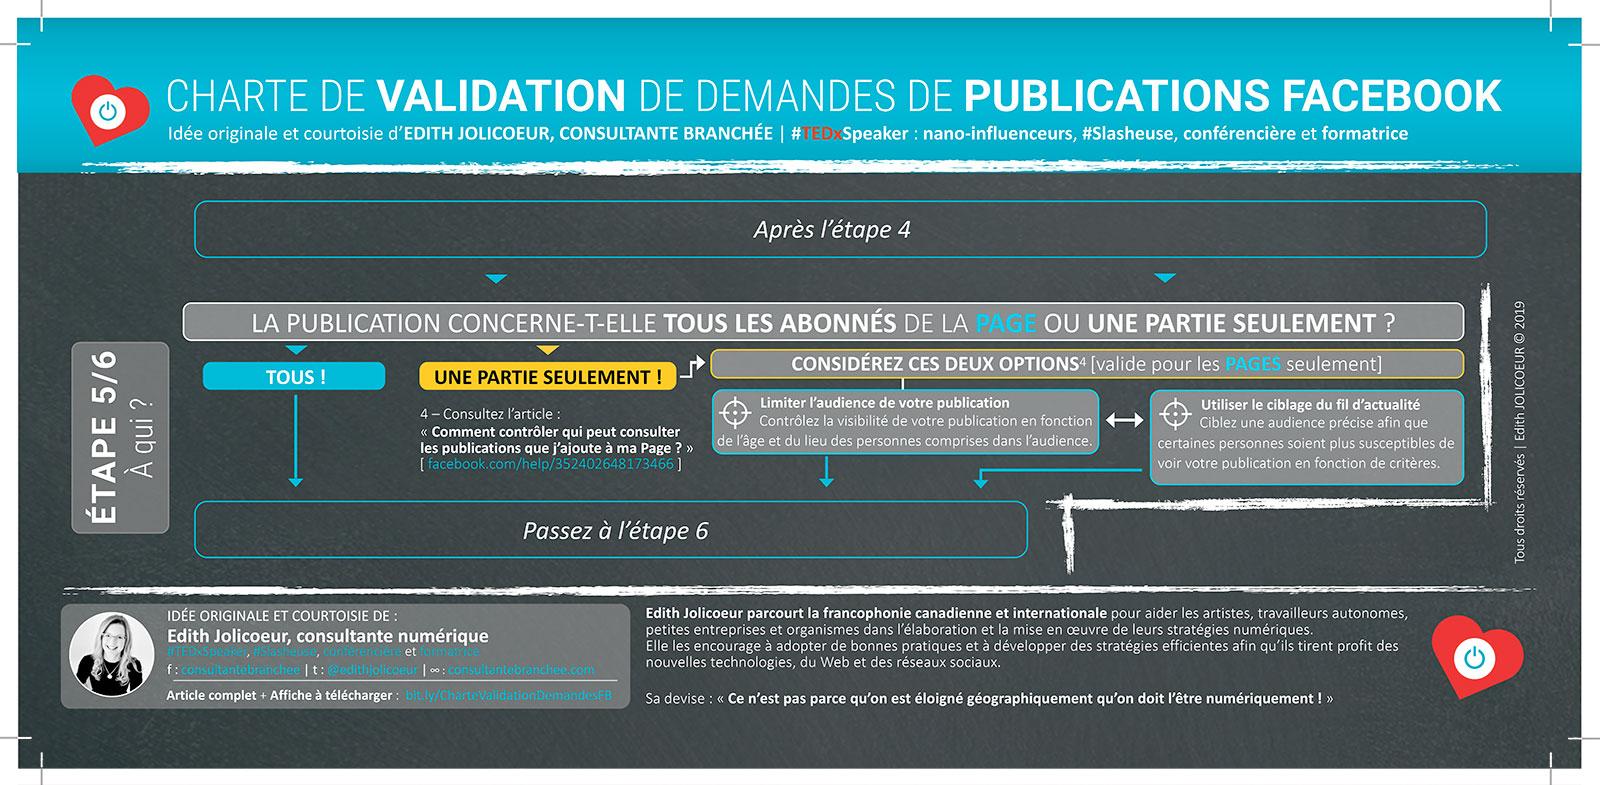 Étape 5 : CHARTE DE VALIDATION de demandes de publications Facebook | Edith JOLICOEUR, consultante branchée